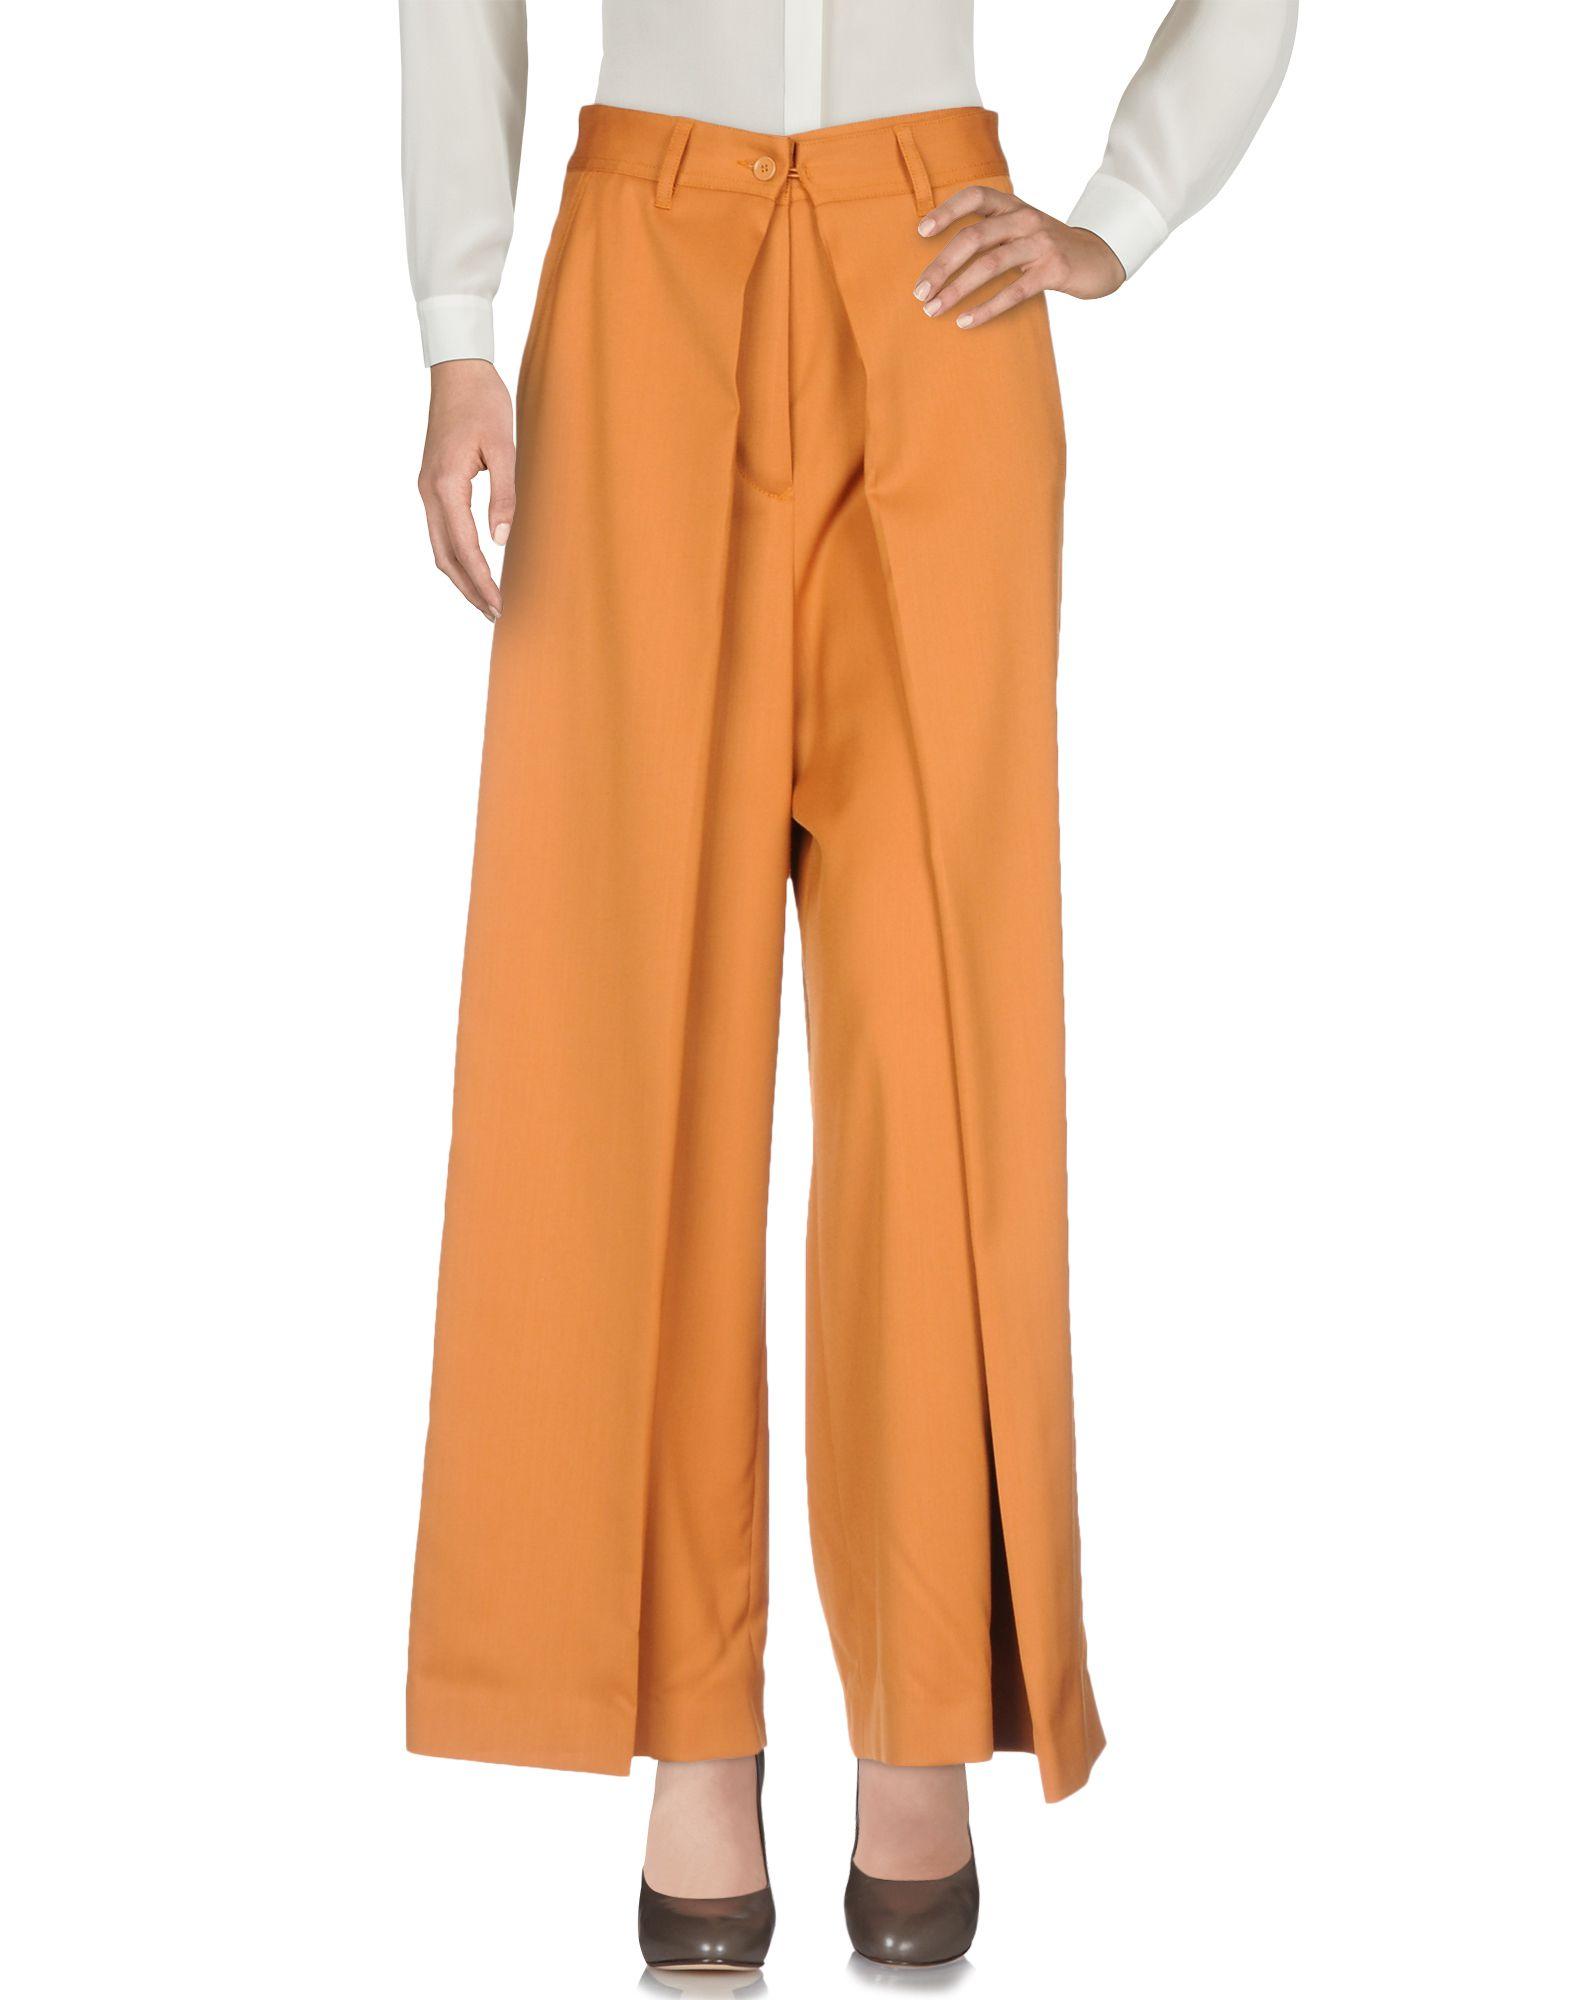 Pantalone Mm6 Maison Margiela damen - 13185181RP